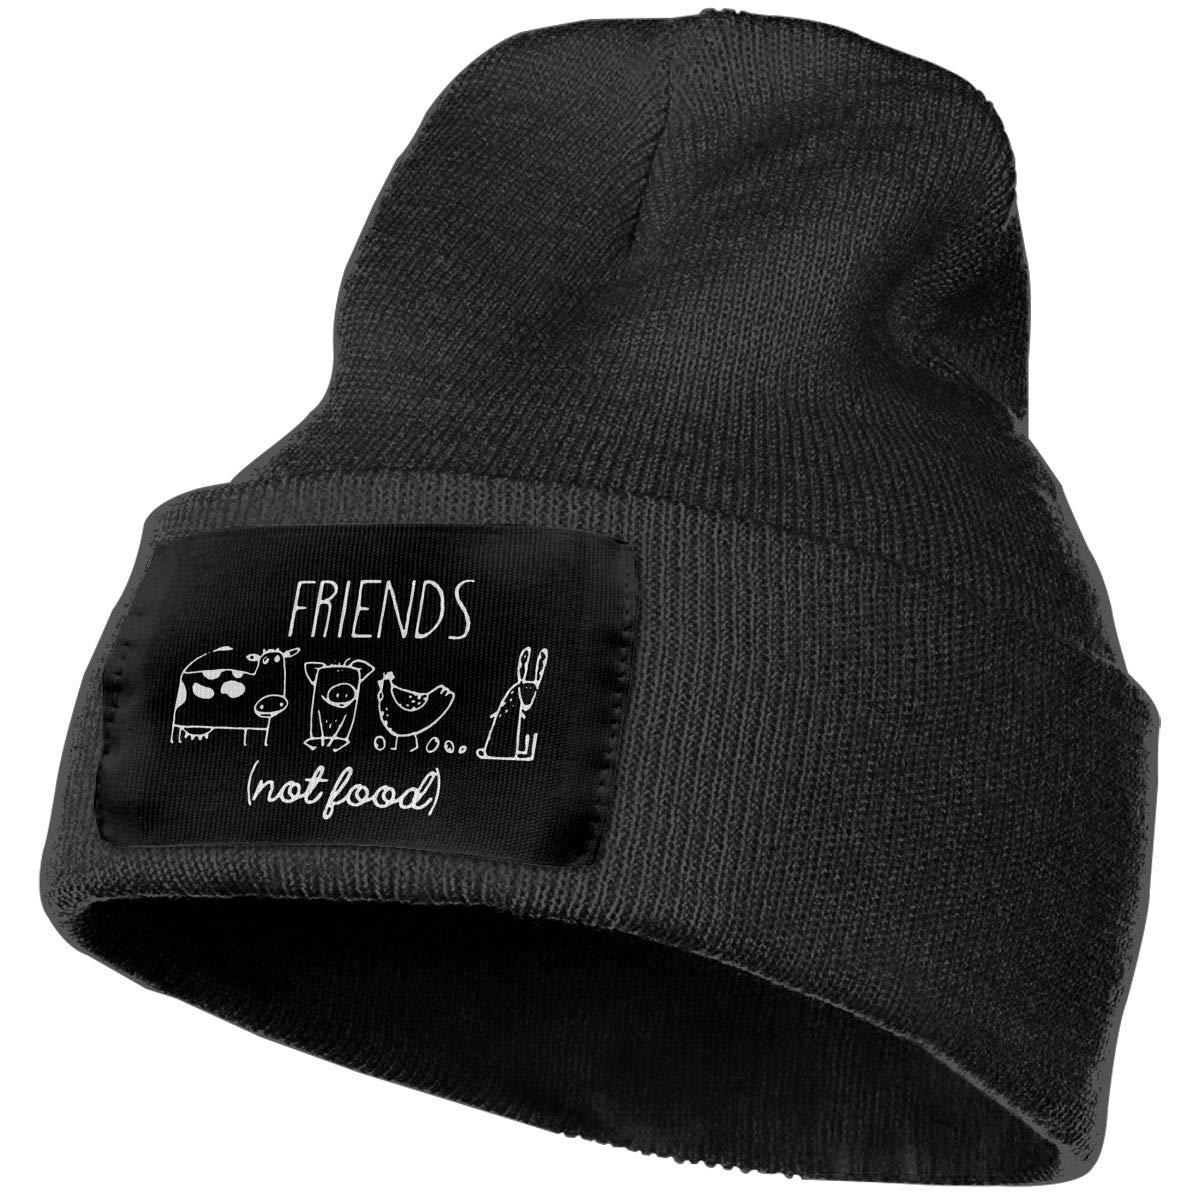 Men /& Women Vegan Vegetarian Animal Lover Outdoor Stretch Knit Beanies Hat Soft Winter Skull Caps